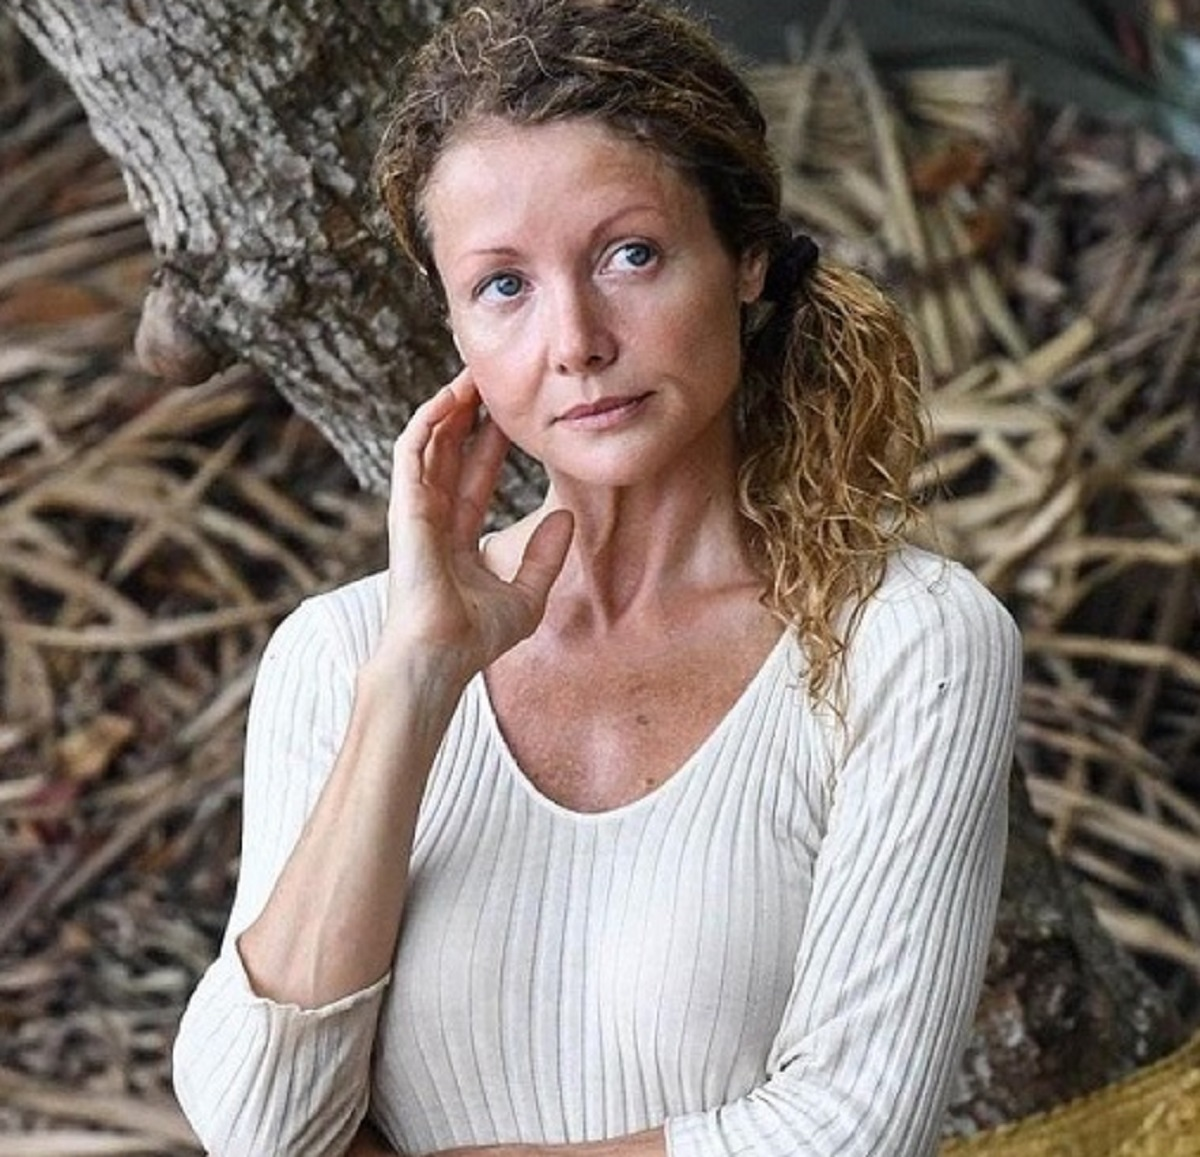 Angela Melillo Isola dei Famosi Awed vincitore motivo